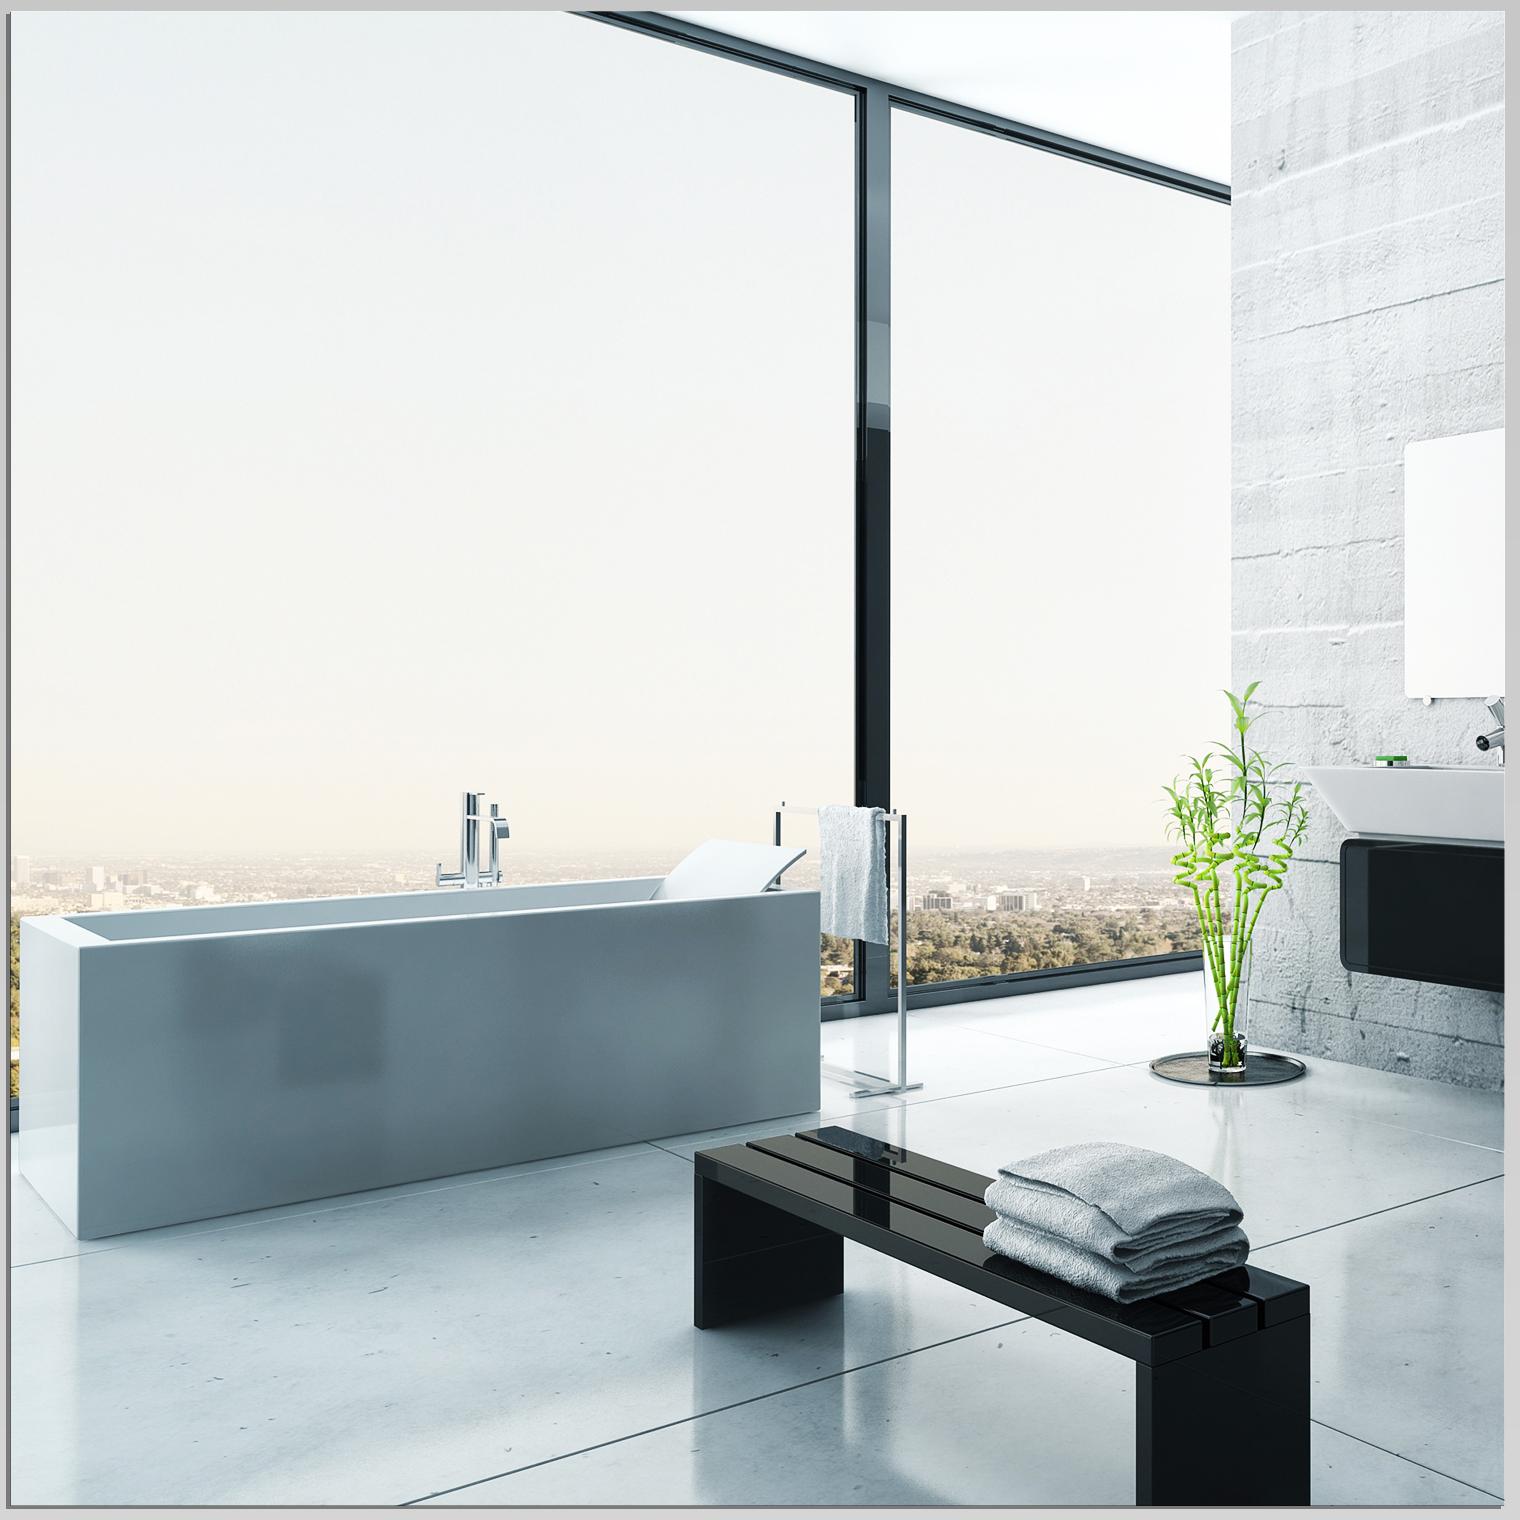 Miroir plexiglass acrylique carr maxi pas cher for Miroir 50x50